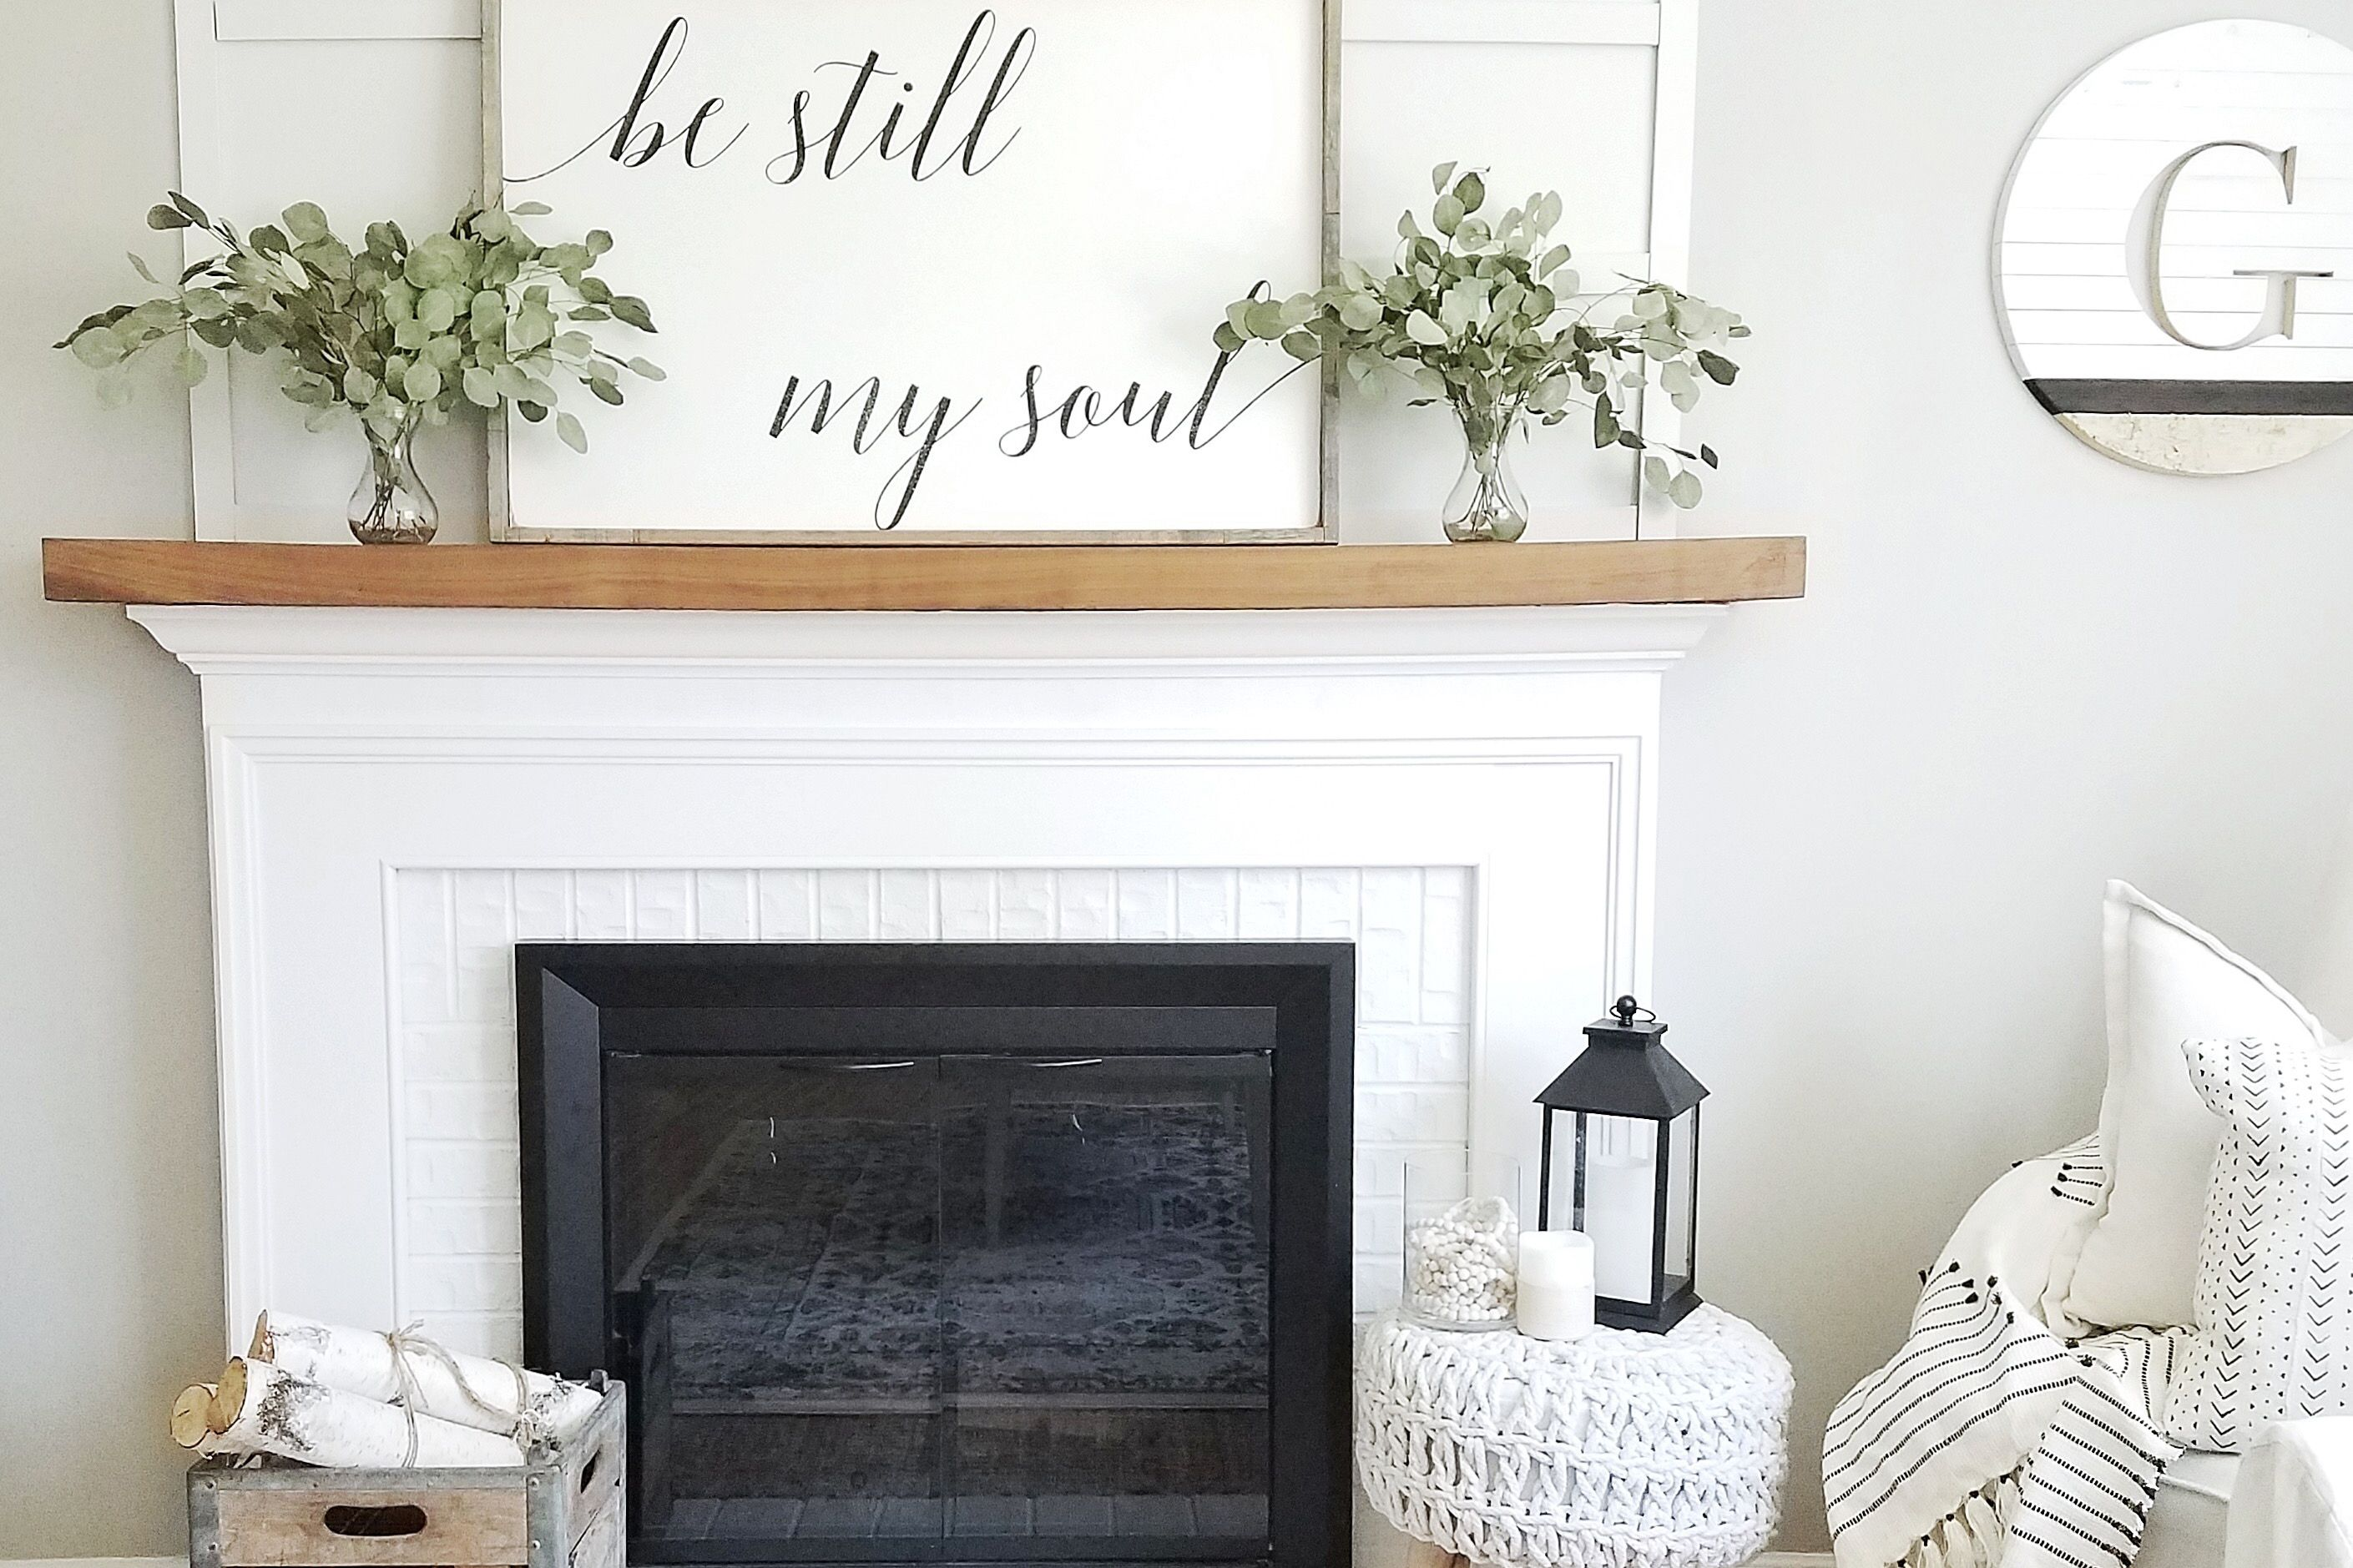 Be Still Soul Fireplace Styling 5963c5cd3df78cdc68be1c9c